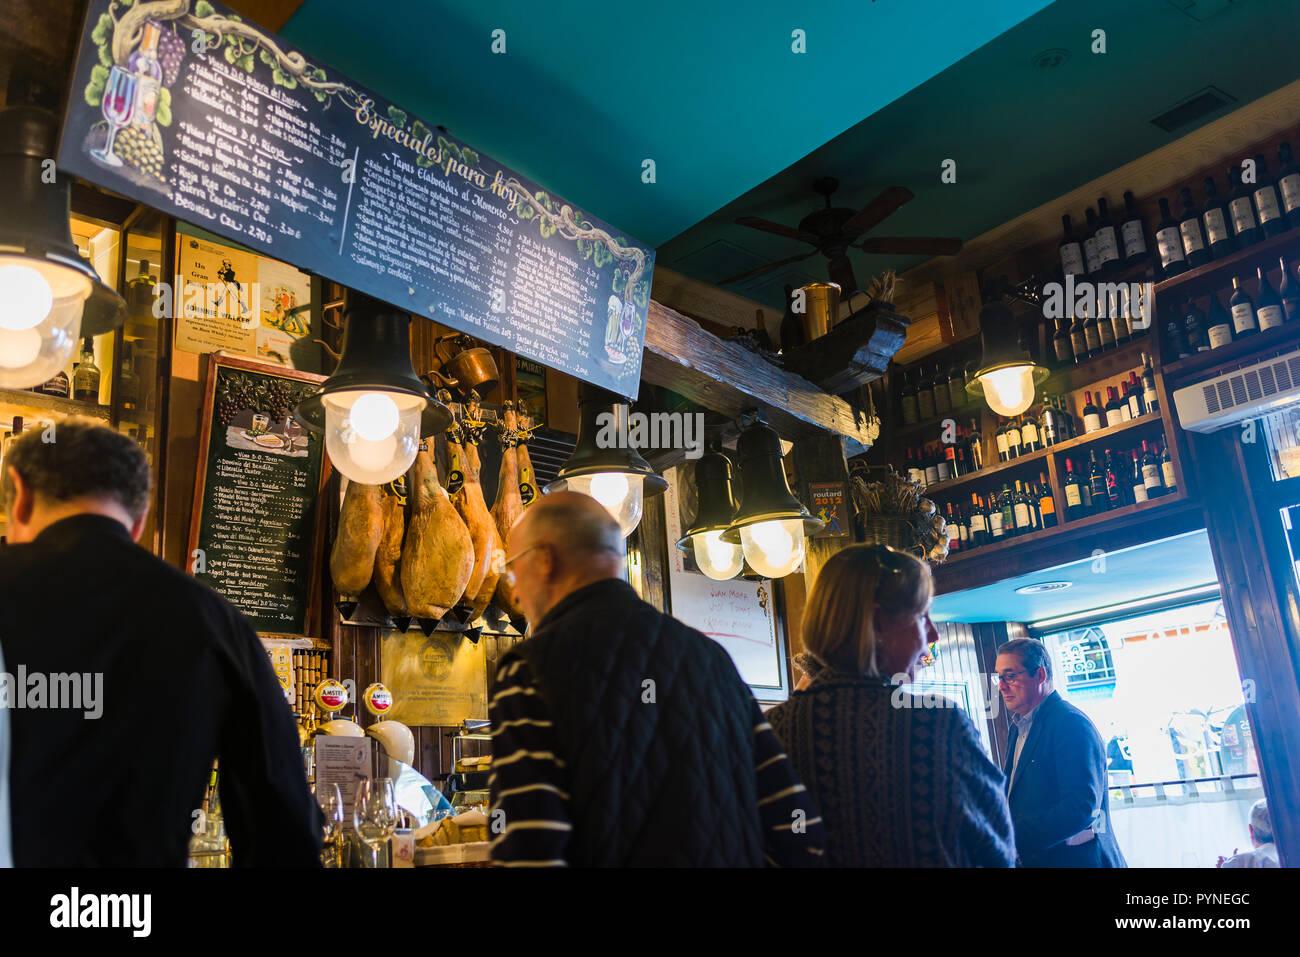 Winery restaurant bar Casa Paca. Salamanca, Castilla y Leon, Spain, Europe - Stock Image